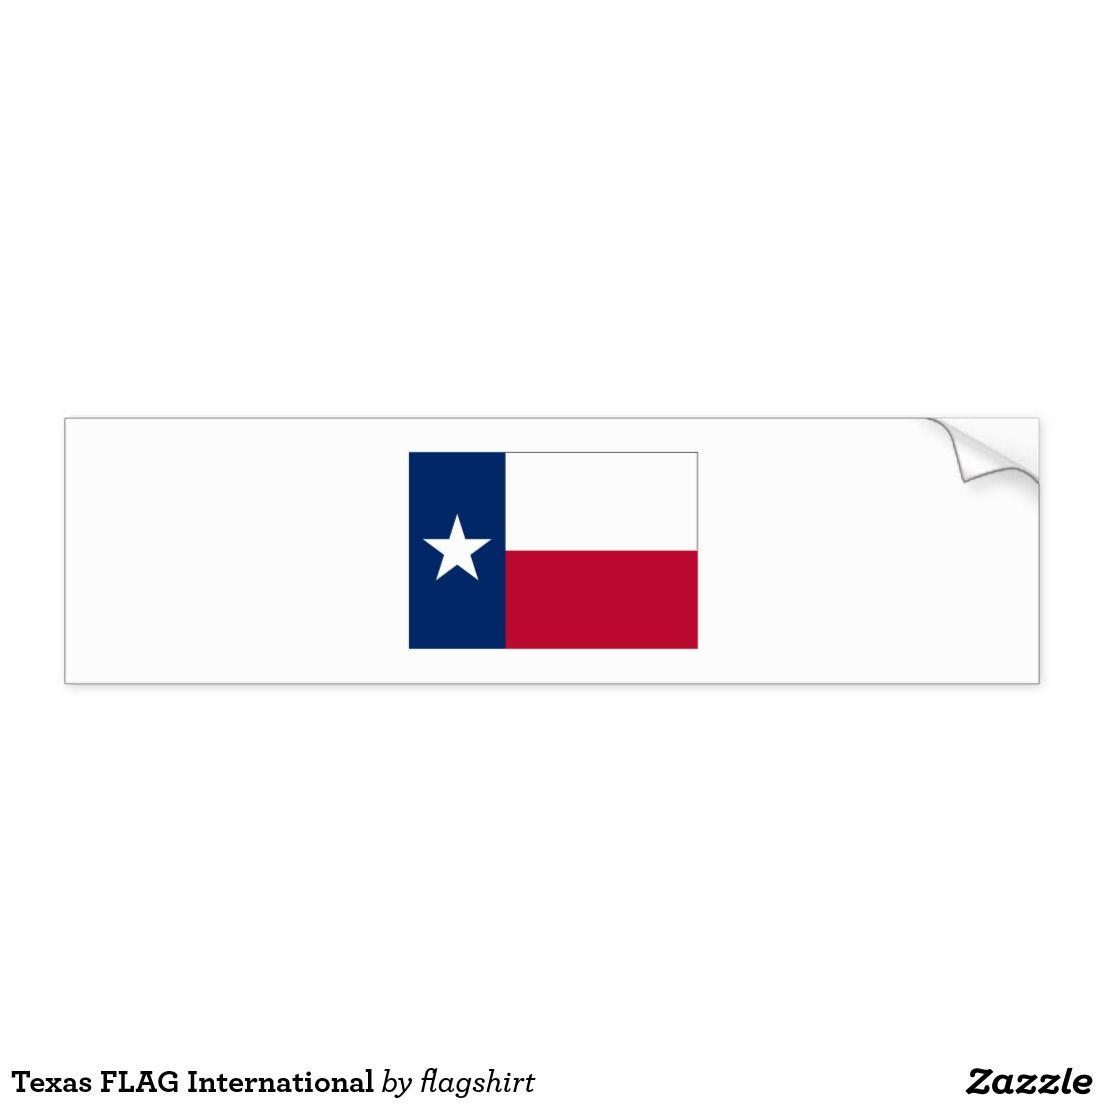 Texas Flag International Bumper Sticker Zazzle Com Bumper Stickers Car Bumper Stickers Texas Flags